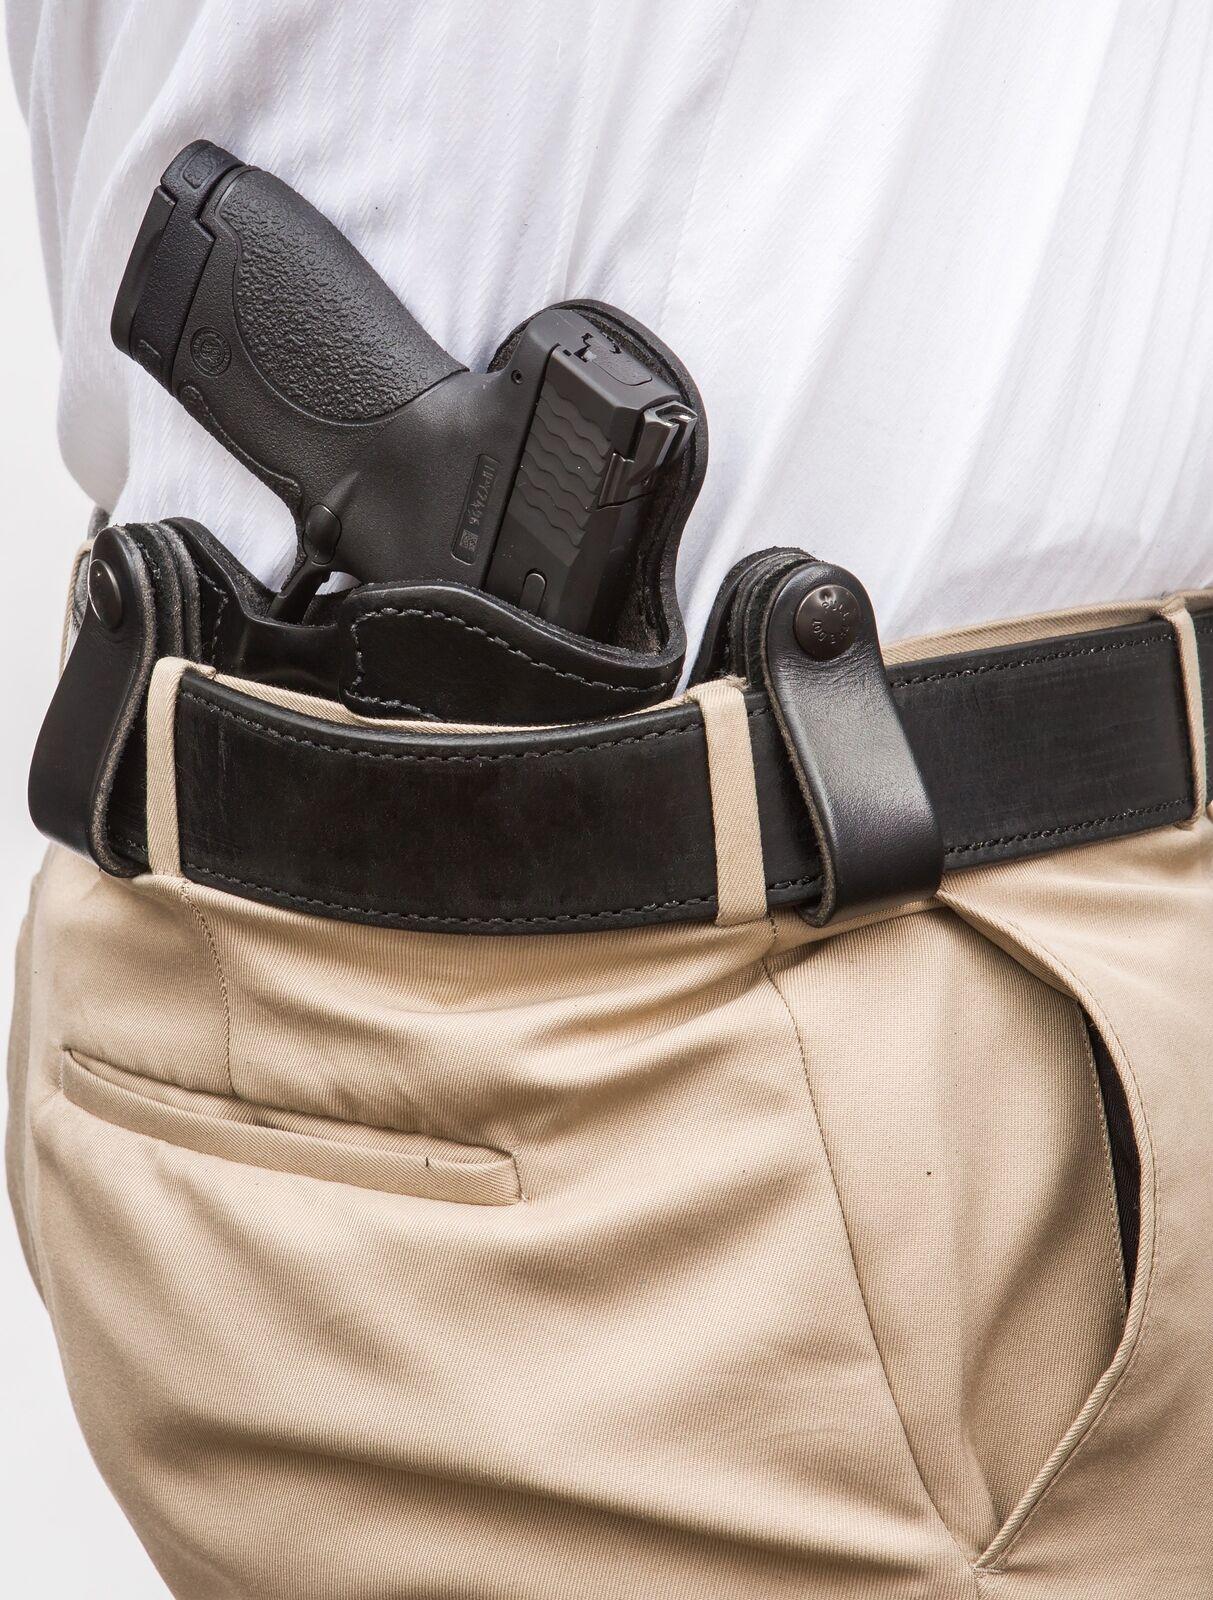 XTREME CARRY CARRY XTREME RH LH IWB Leder Gun Holster For Colt Officer d909d7